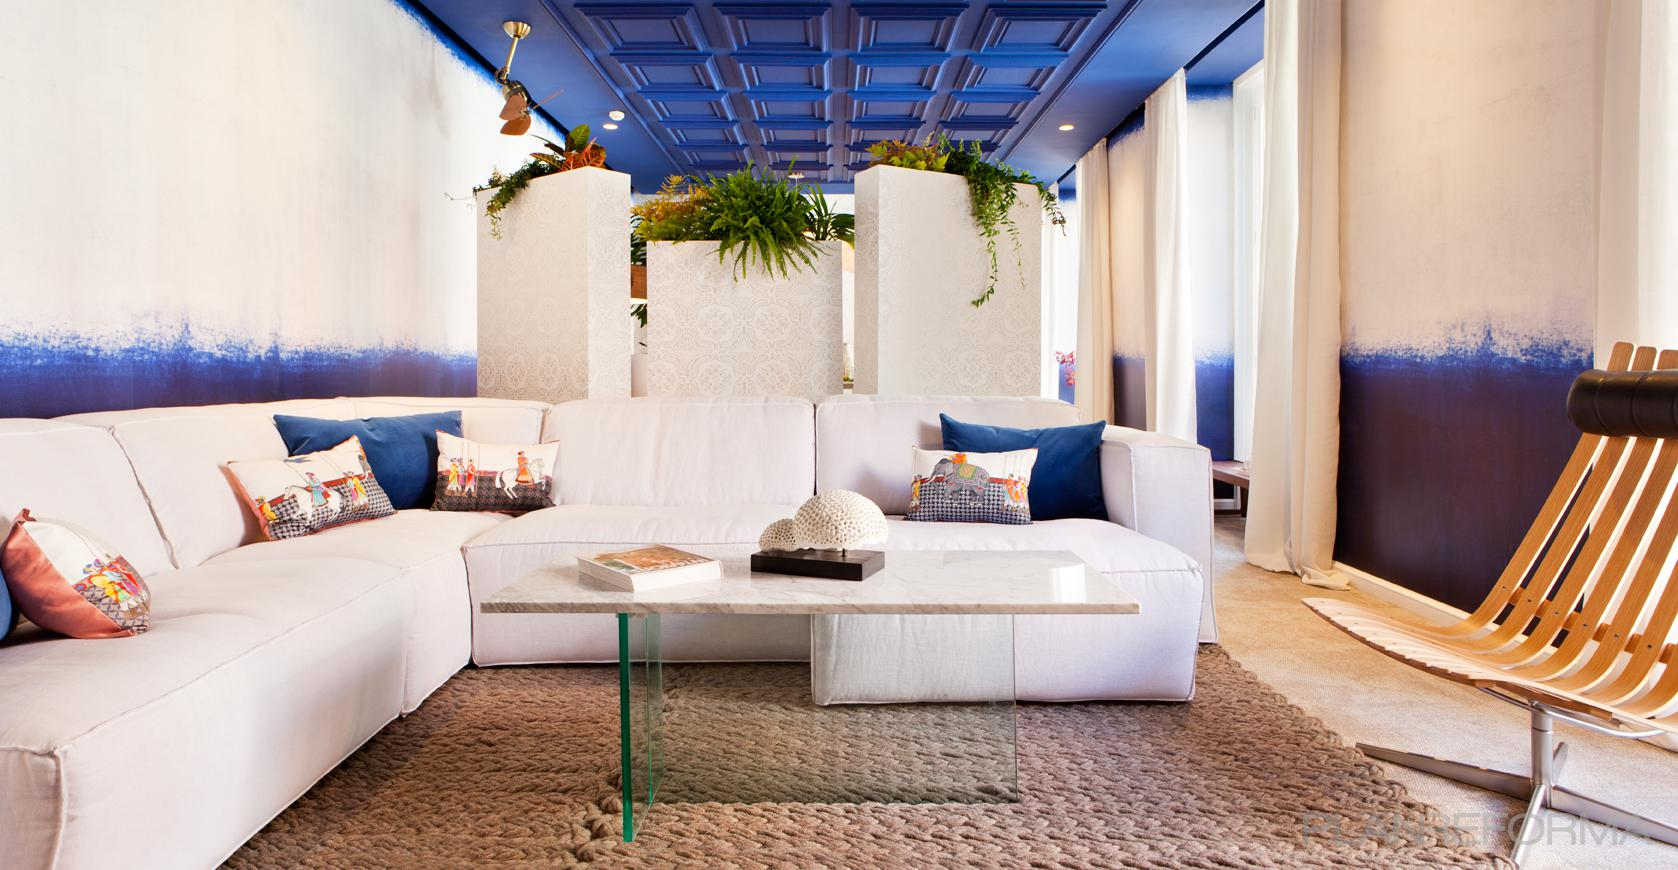 Salon estilo mediterraneo color azul azul oscuro blanco - Salon mediterraneo ...